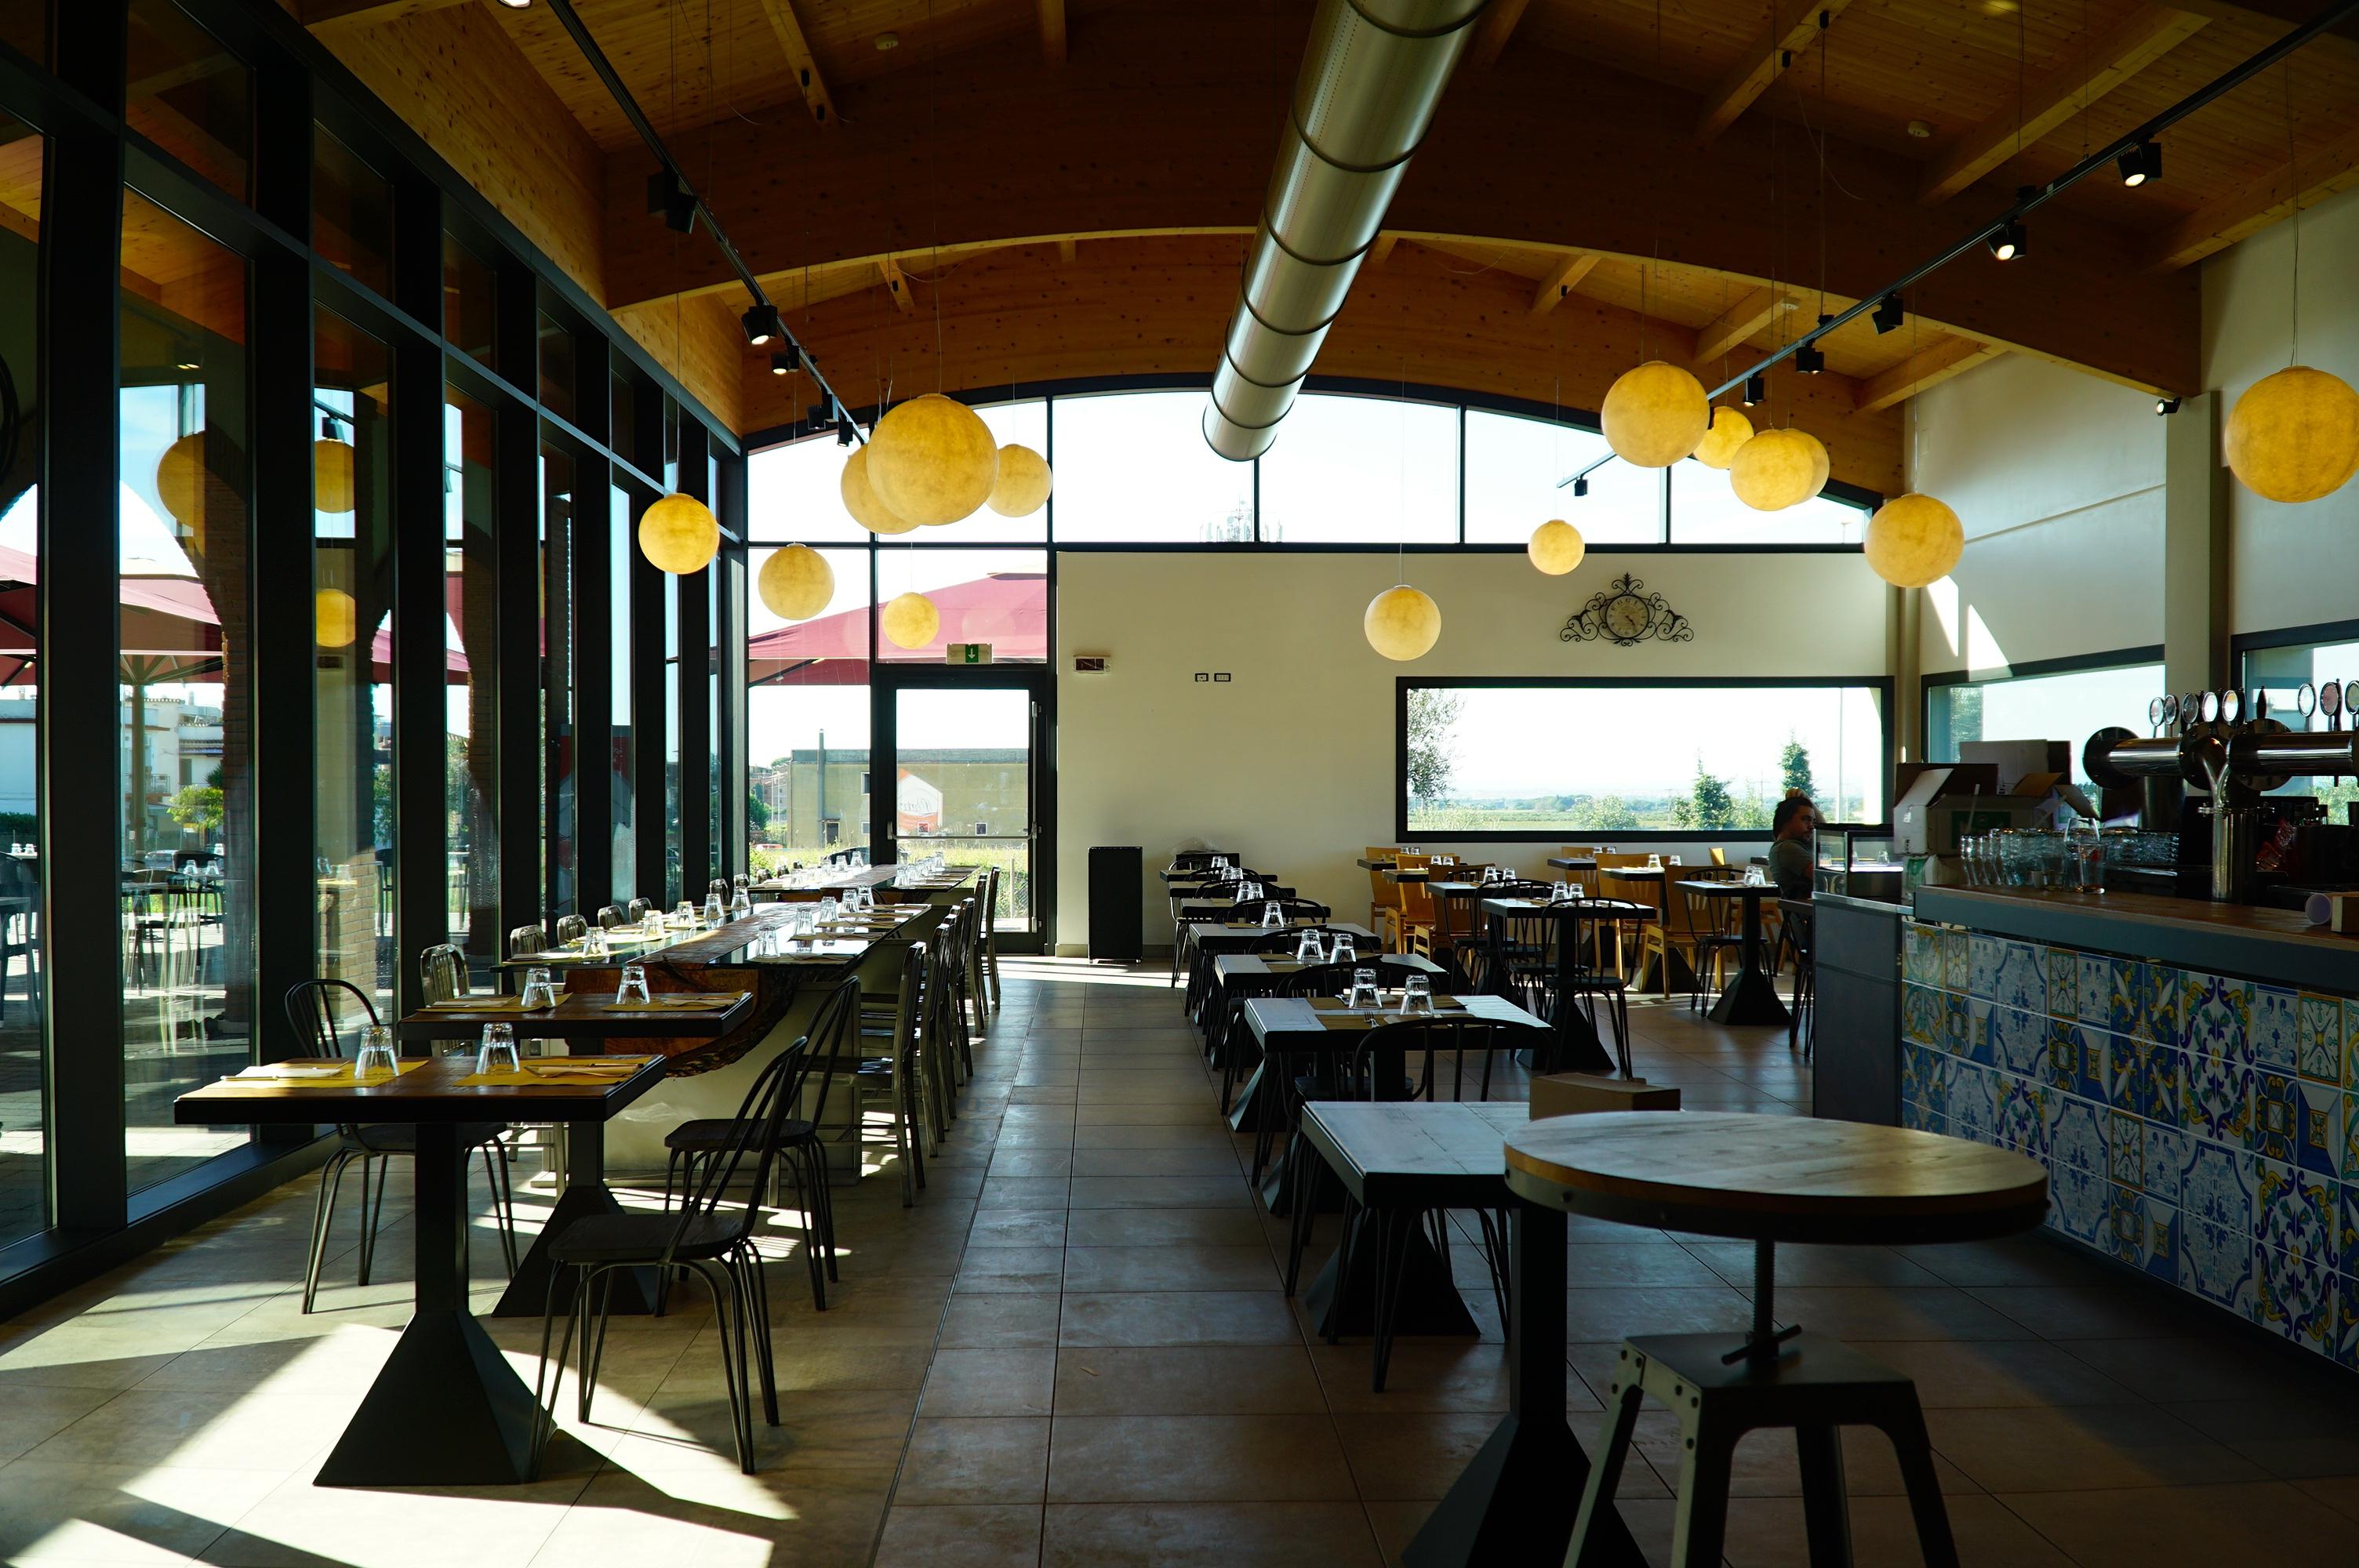 Sala E Cucina Open Space. Amazing Arredo Per Cucina E ...